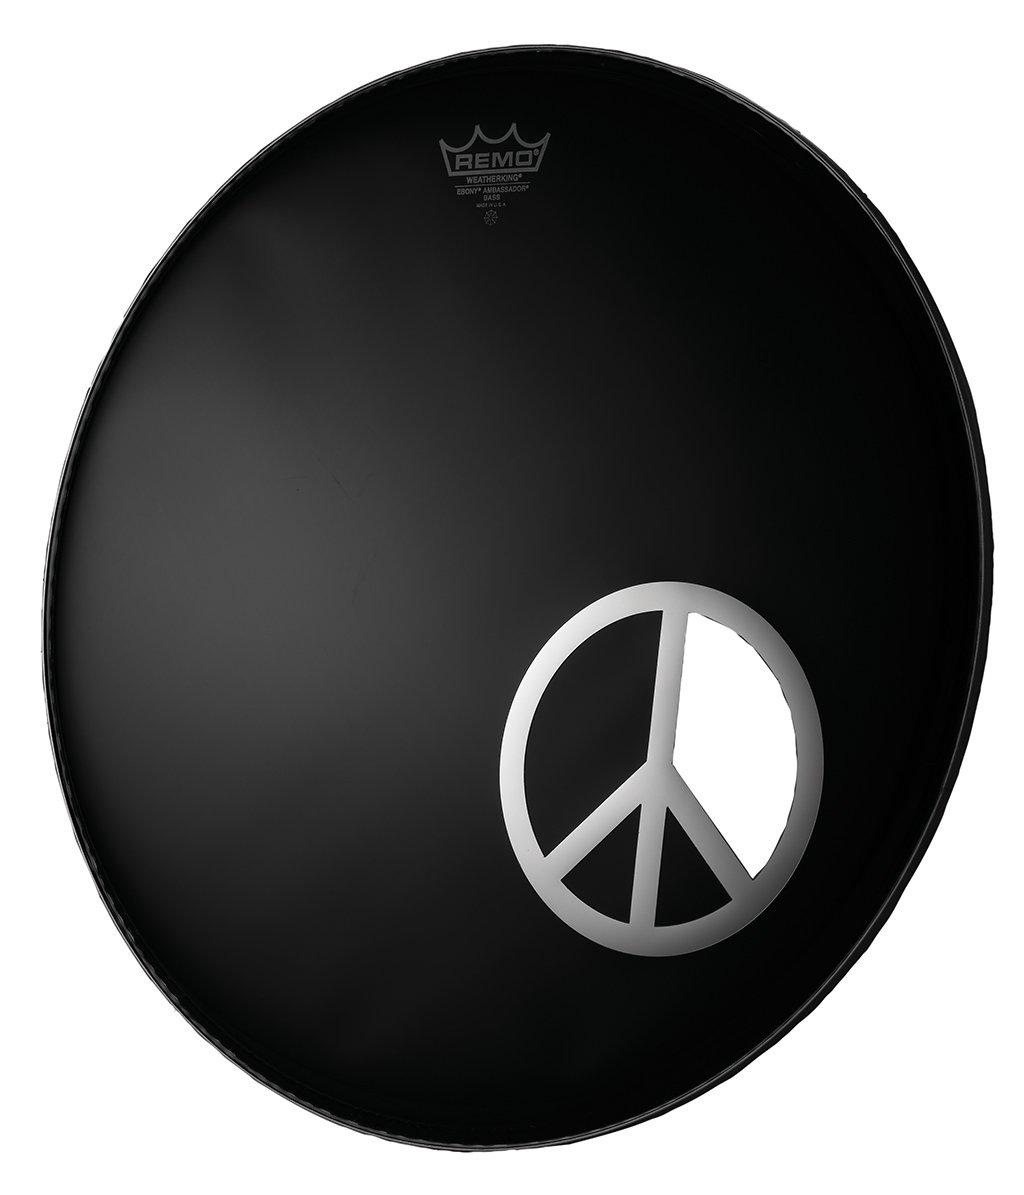 Remo DM-PC06-10 6-Inch Chrome Graphic Dynamo, Peace Sign KMC Music Inc